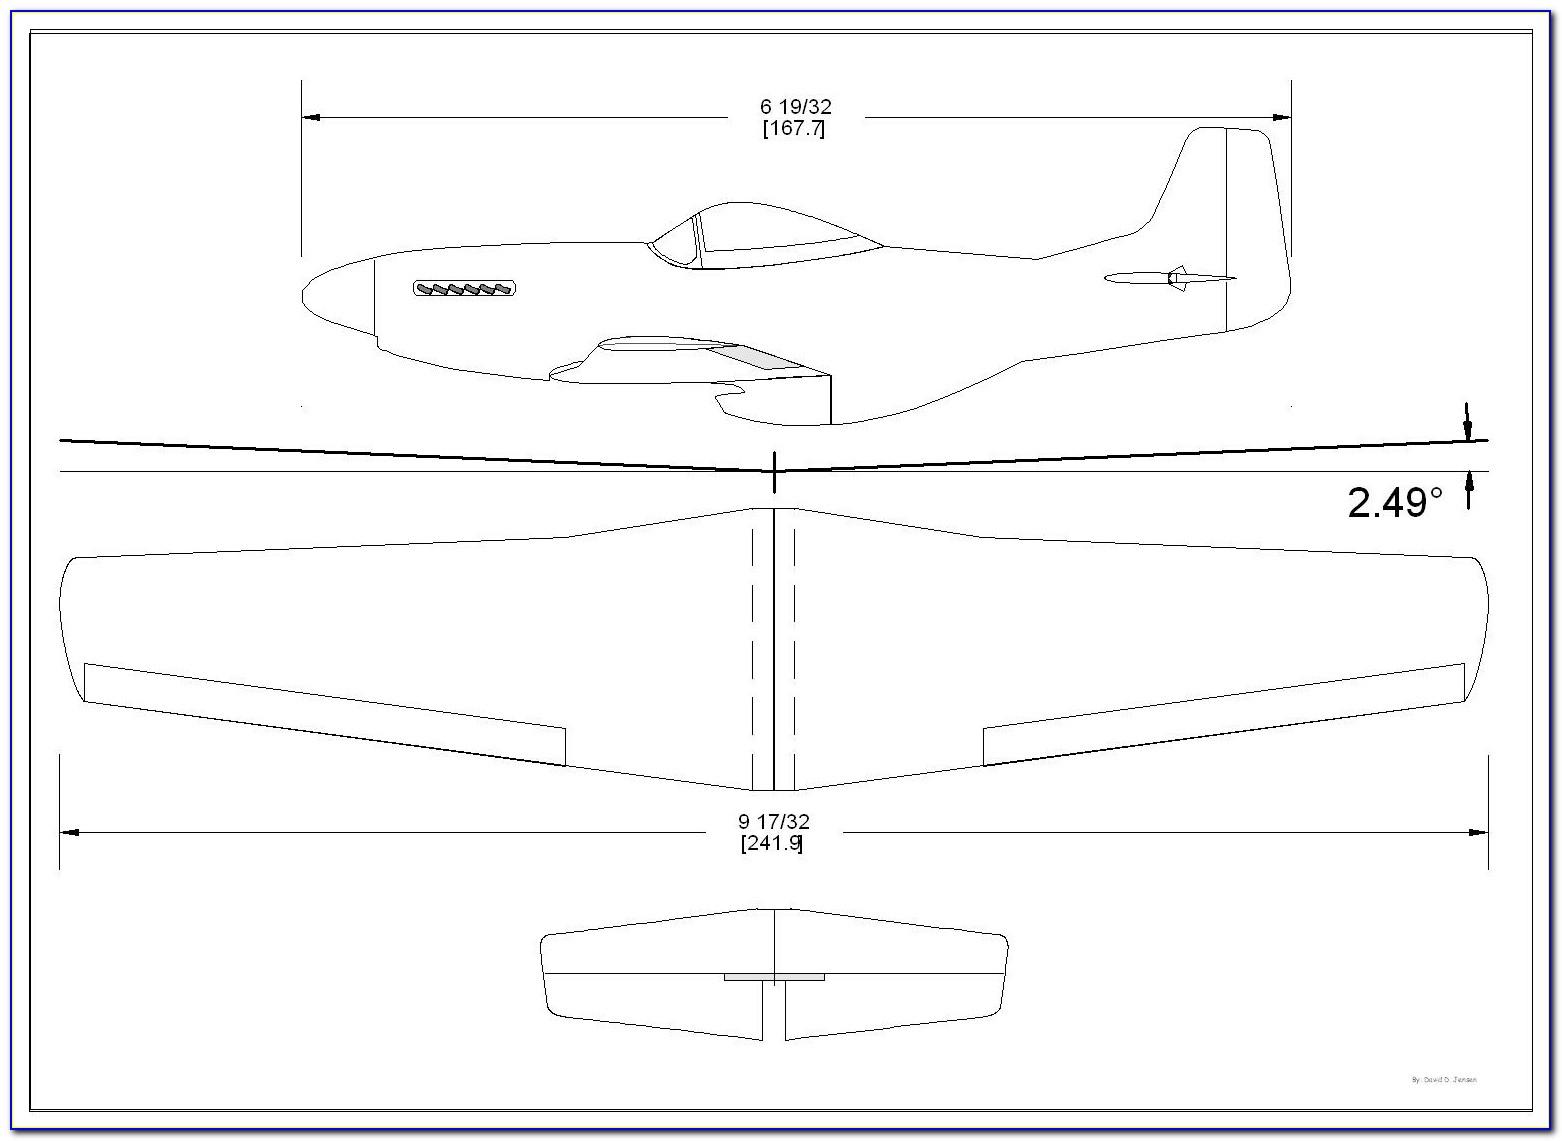 Balsa Wood Airplane Template